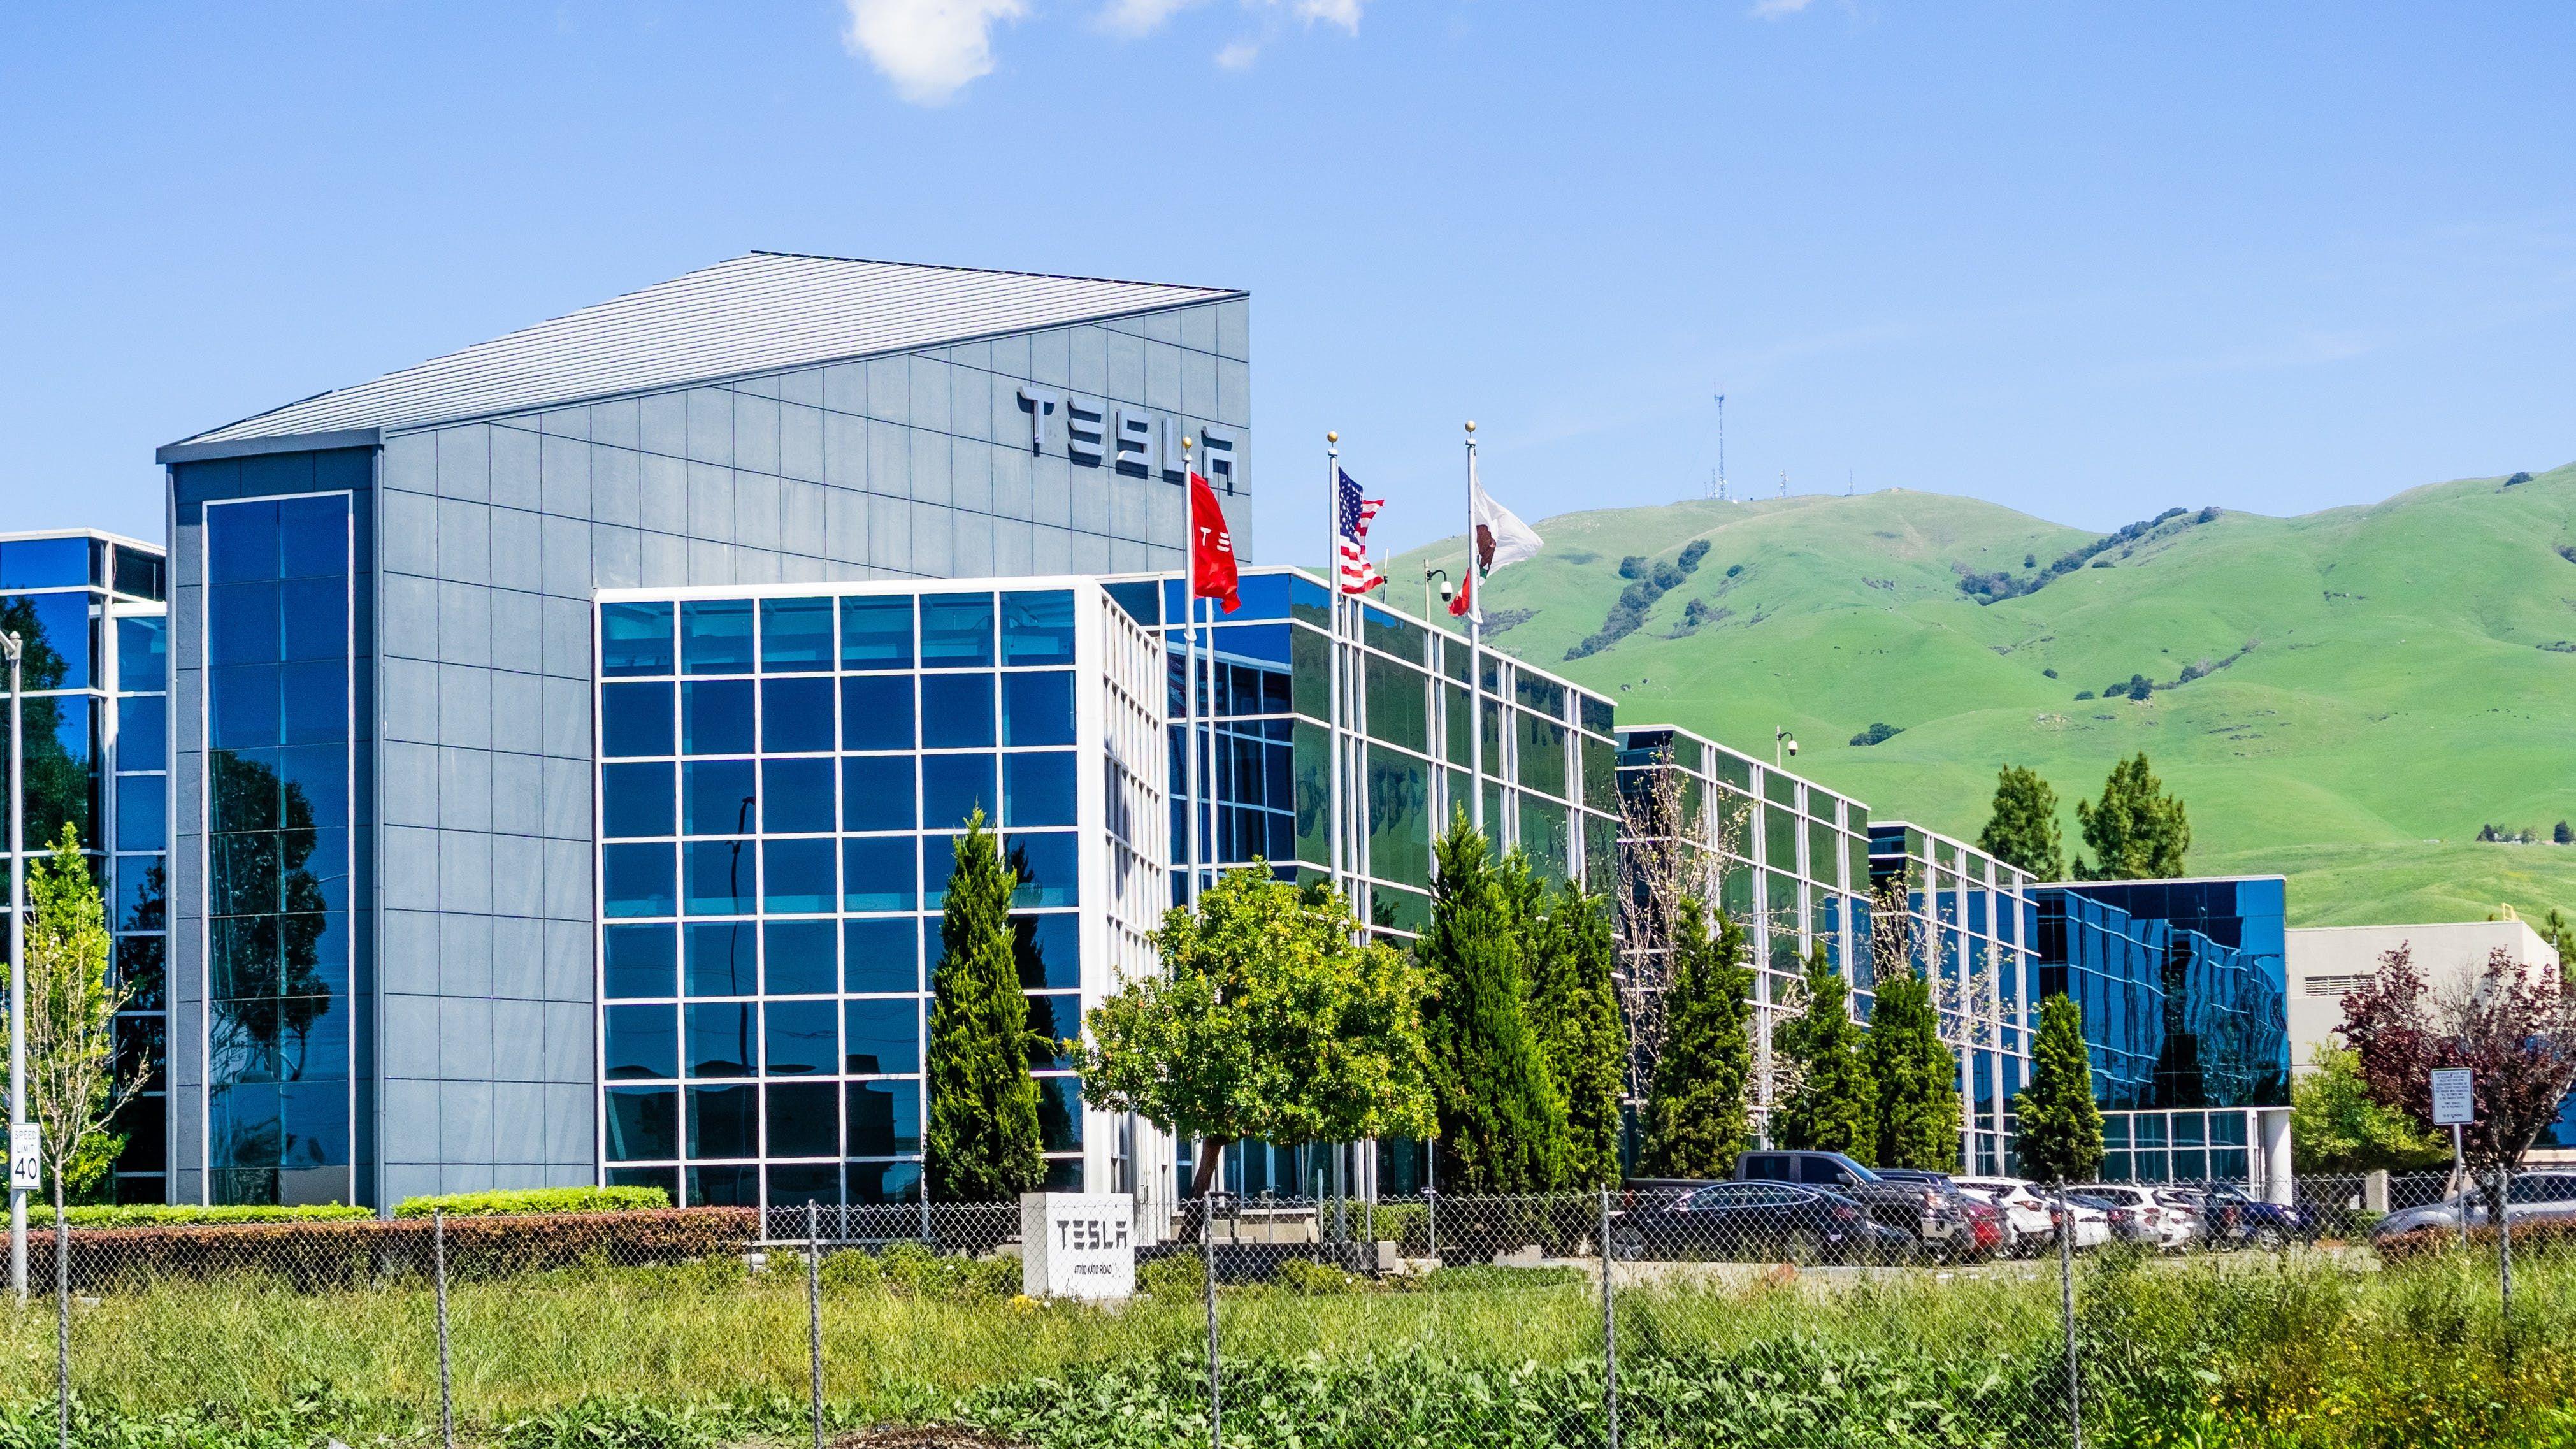 Tesla Gigafactory 3 A Step Closer To Model 3 Production Market Realist